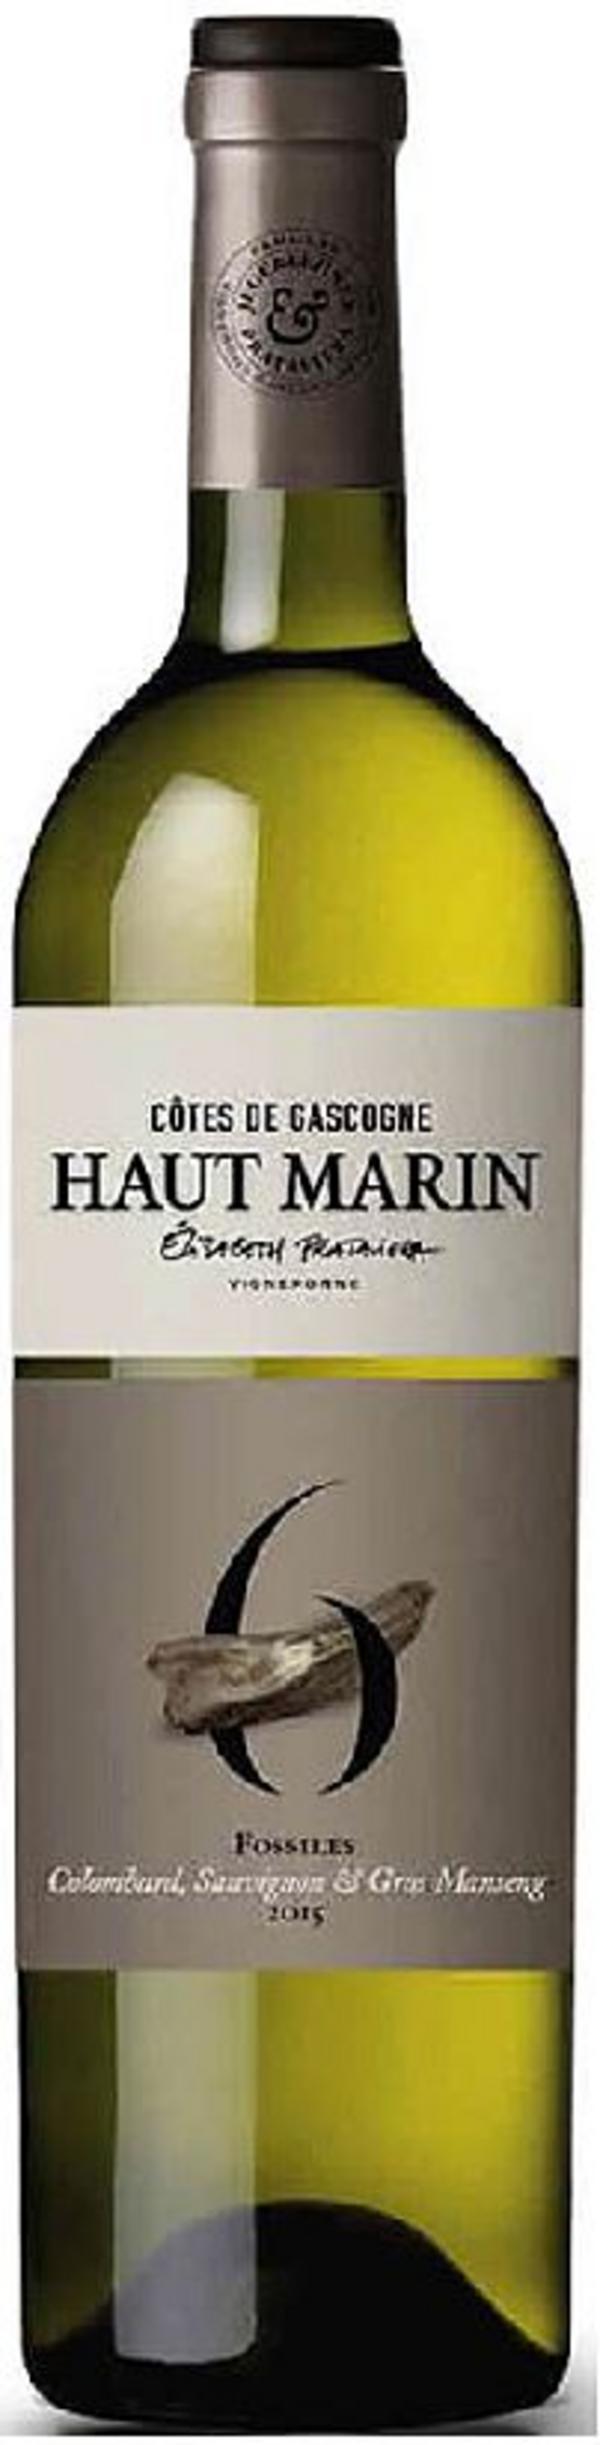 Haut Marin Cuvée Fossiles 2017.